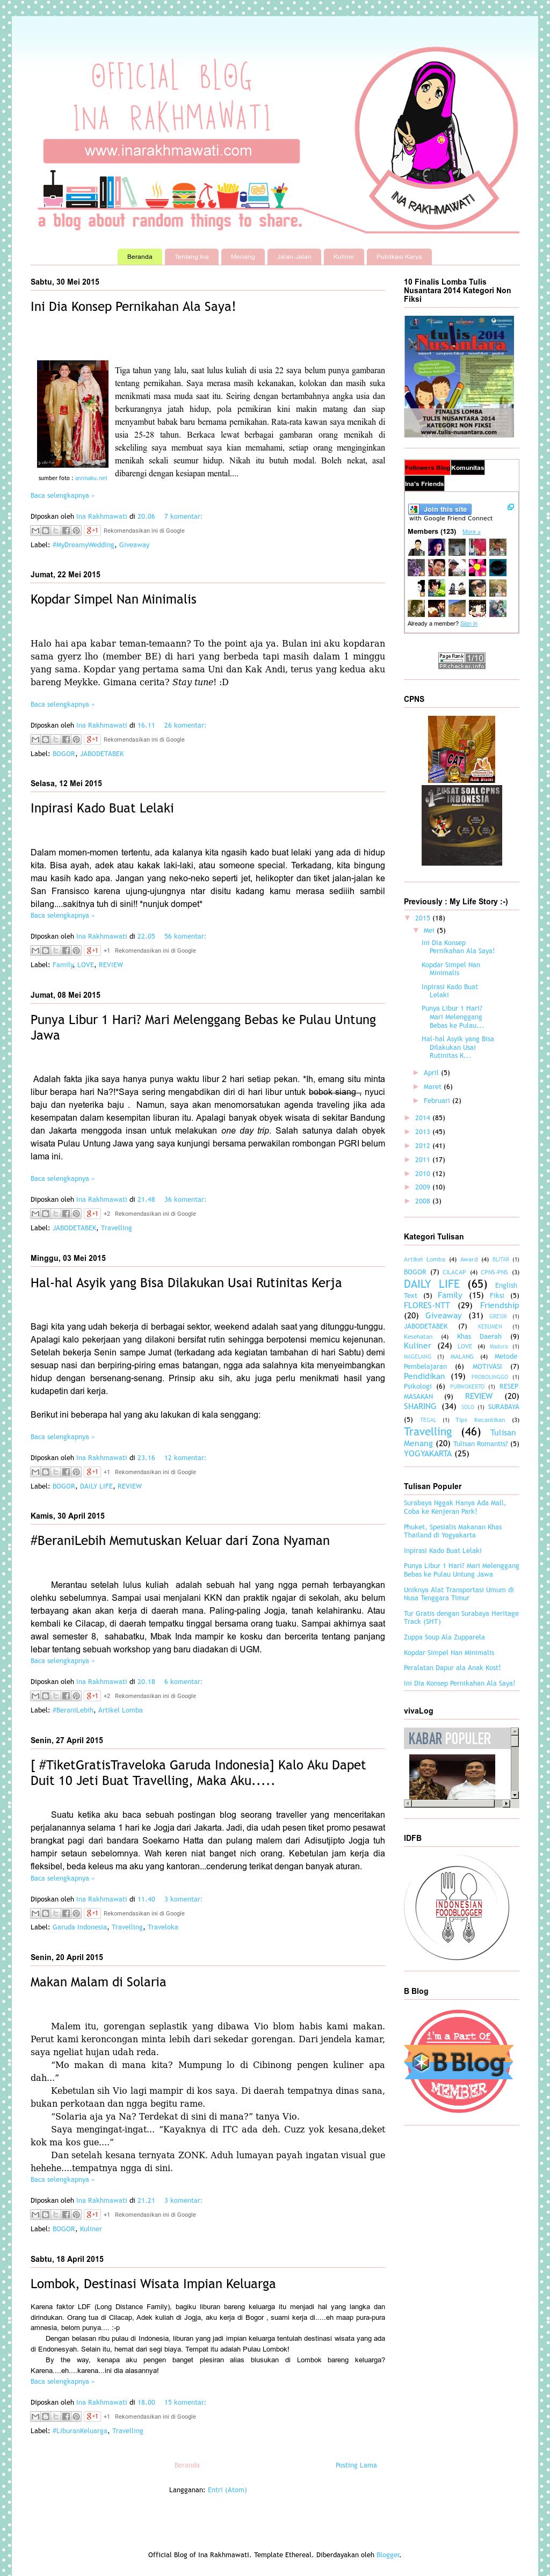 Inarakhmawati Competitors Revenue And Employees Owler Company Profile Aku April 2010